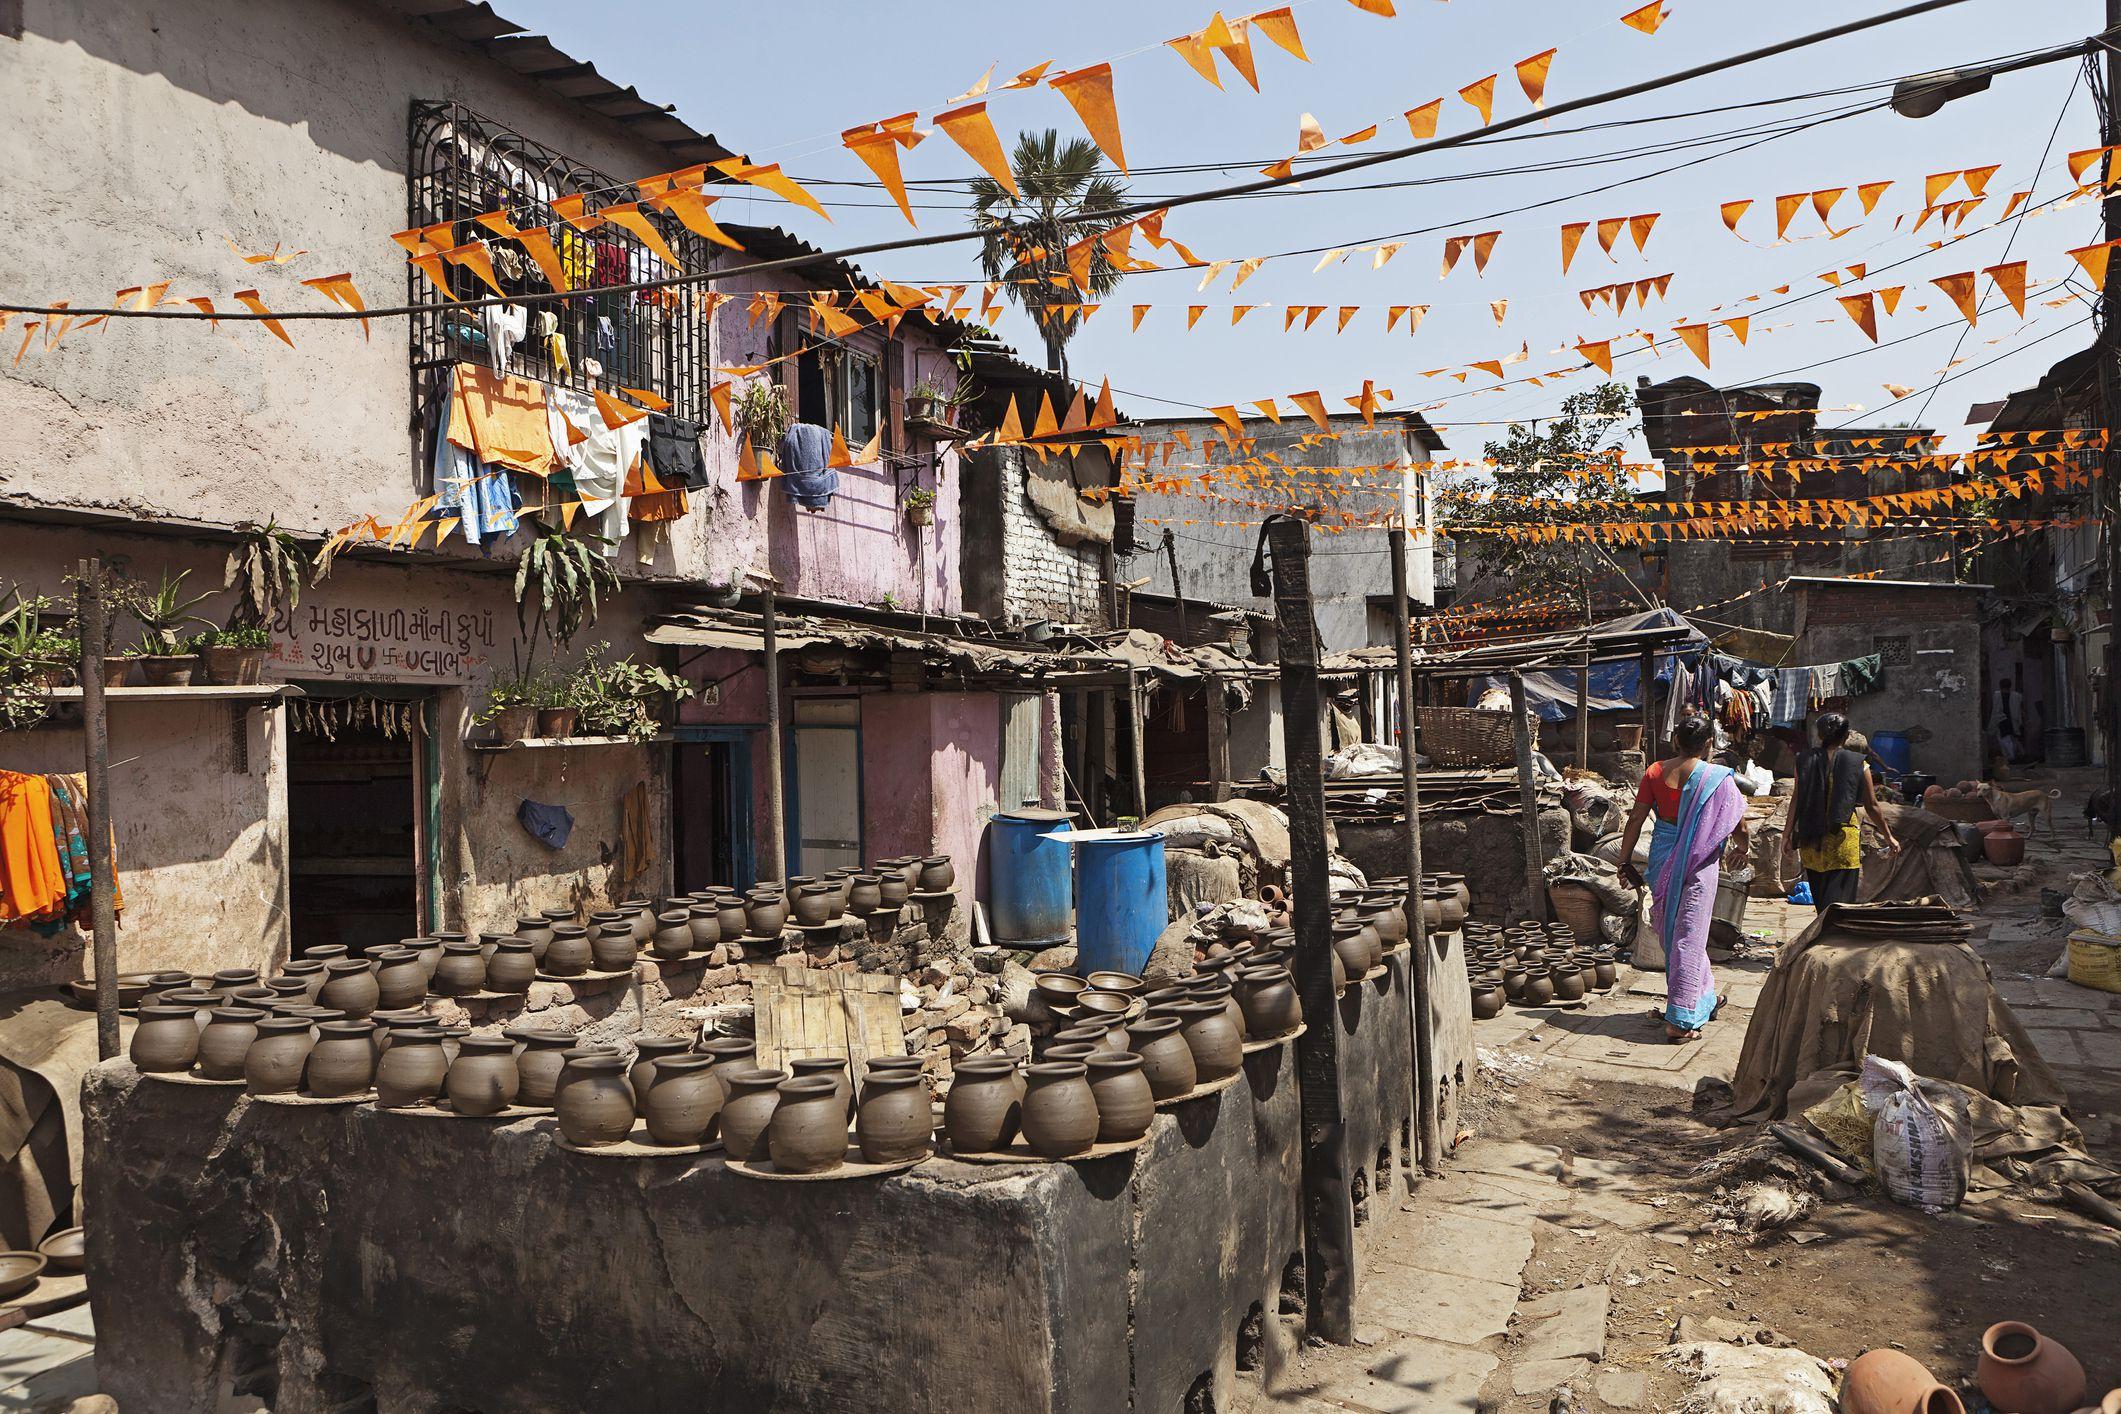 Pottery colony in Dharavi slum, Mumbai.